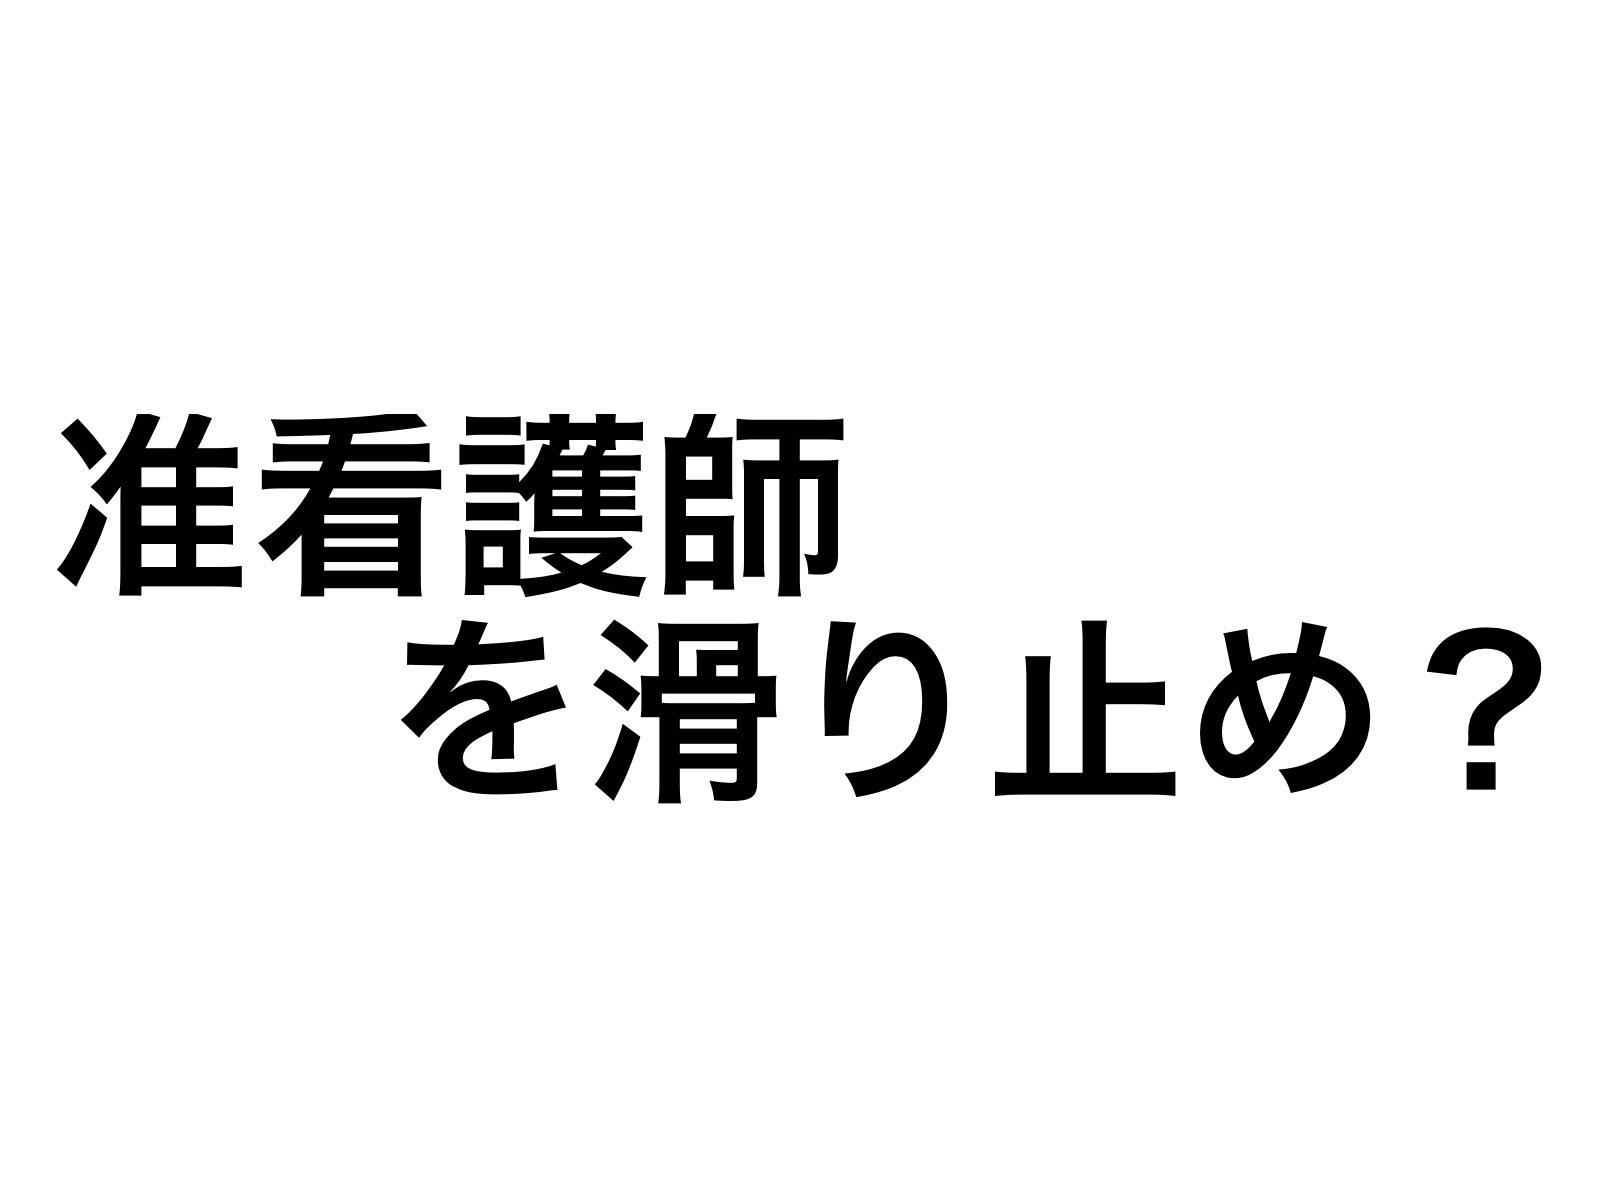 2016 11 14 18 08 03